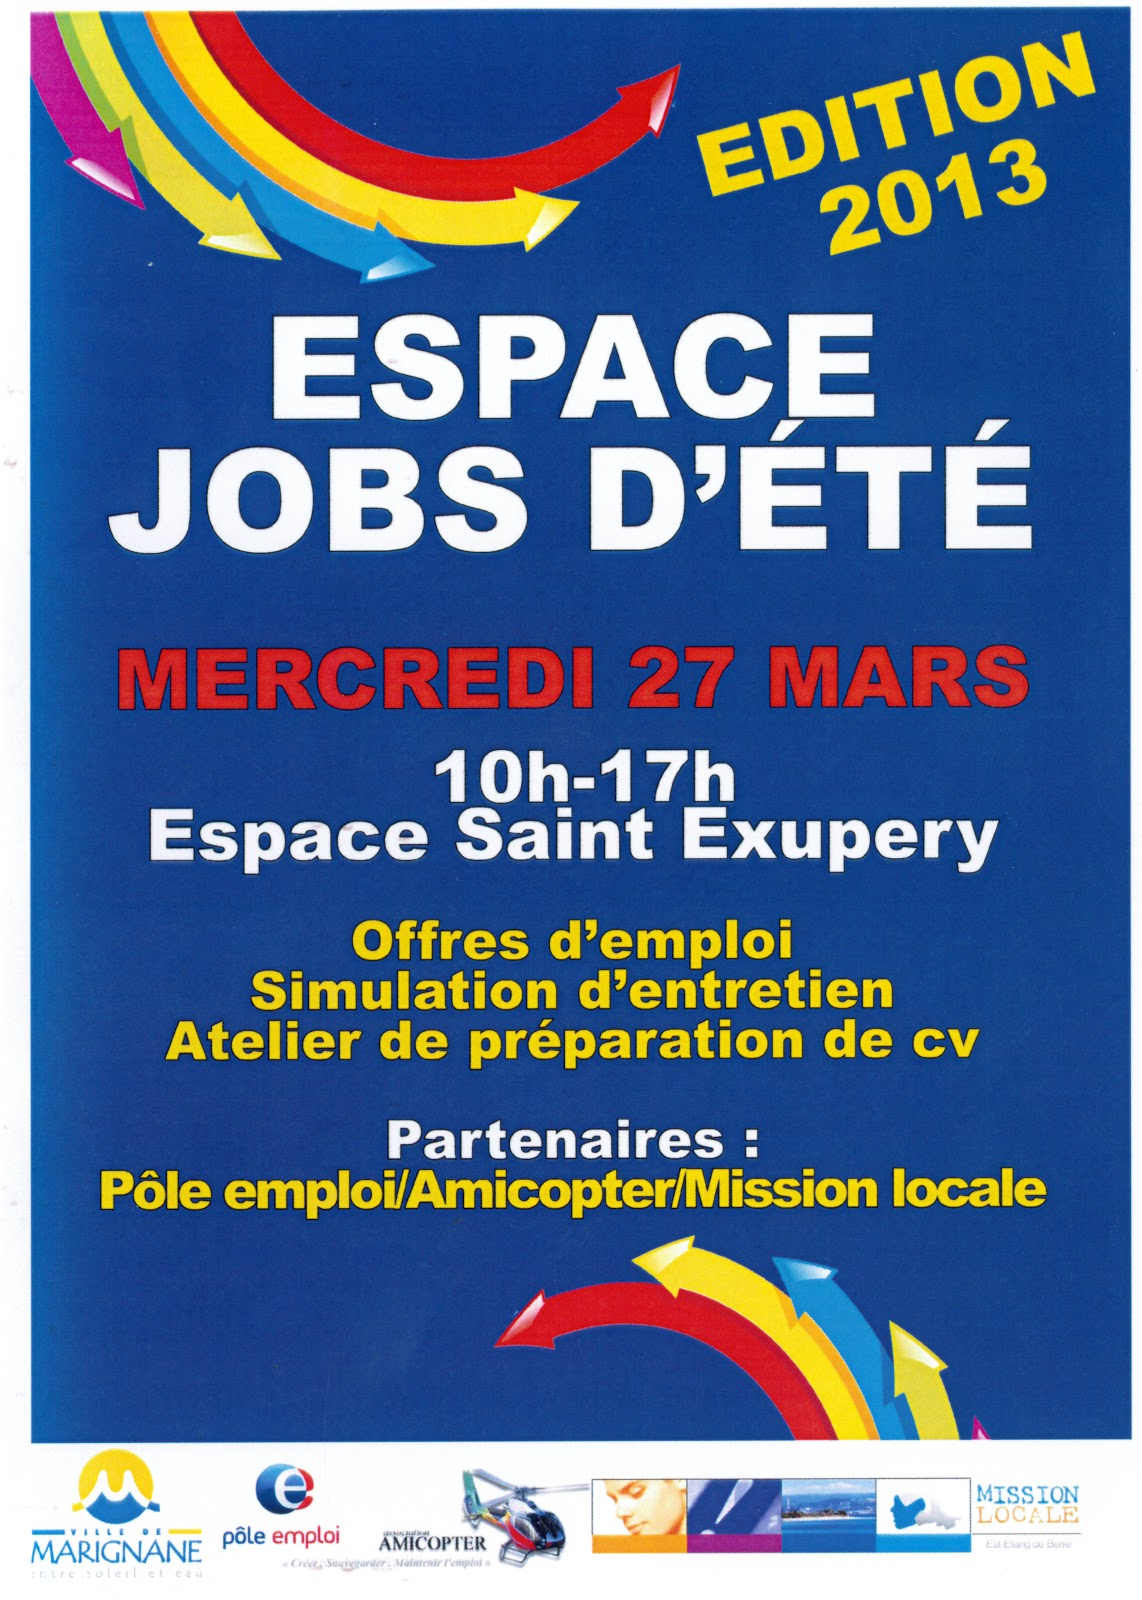 espagne jobs d u0026 39  u00e9t u00e9 - mercredi 27 mars